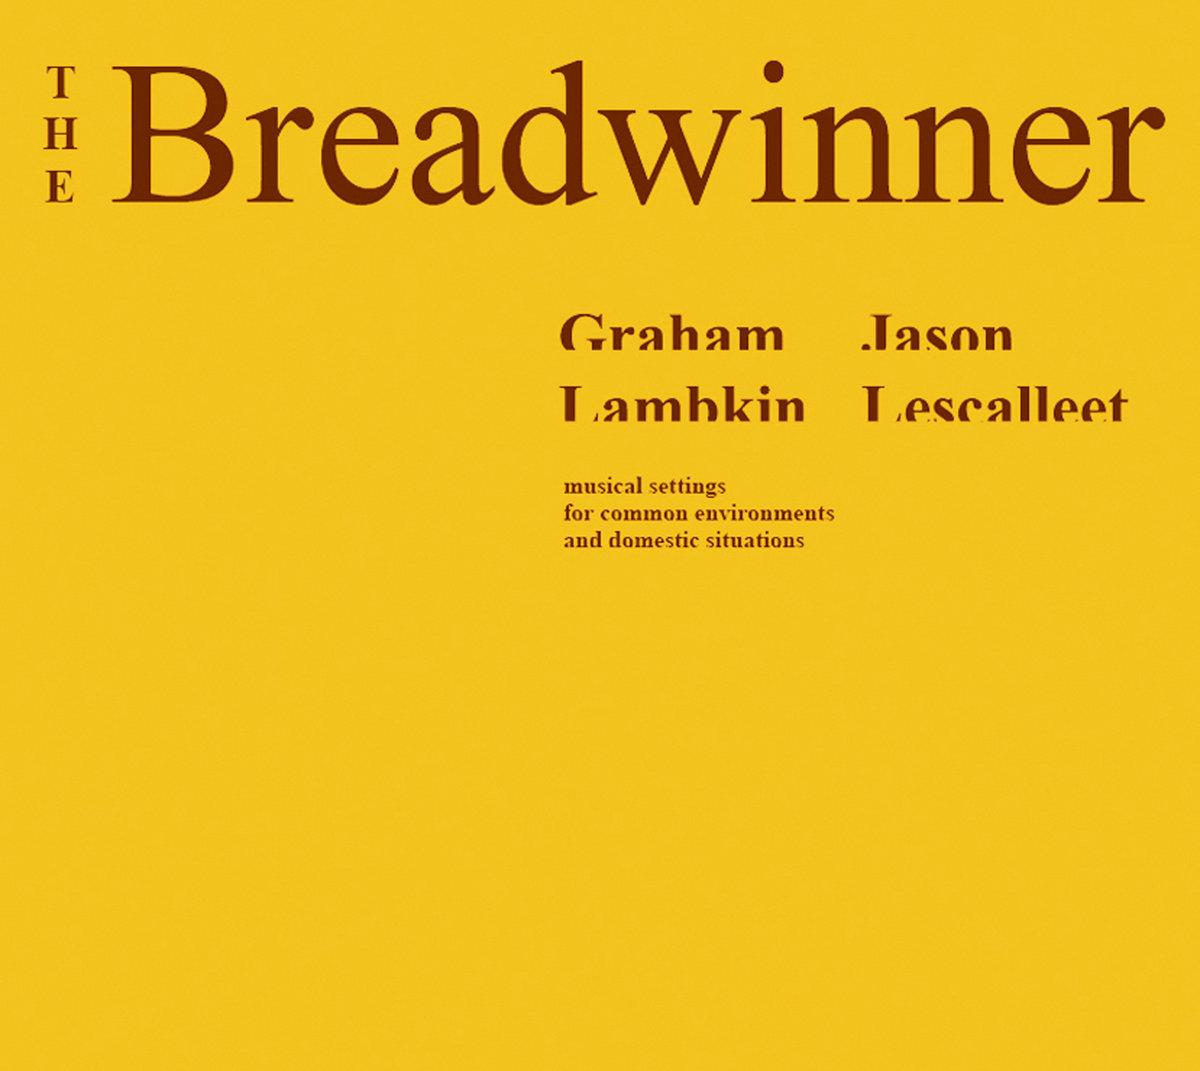 The Breadwinner Album Cover